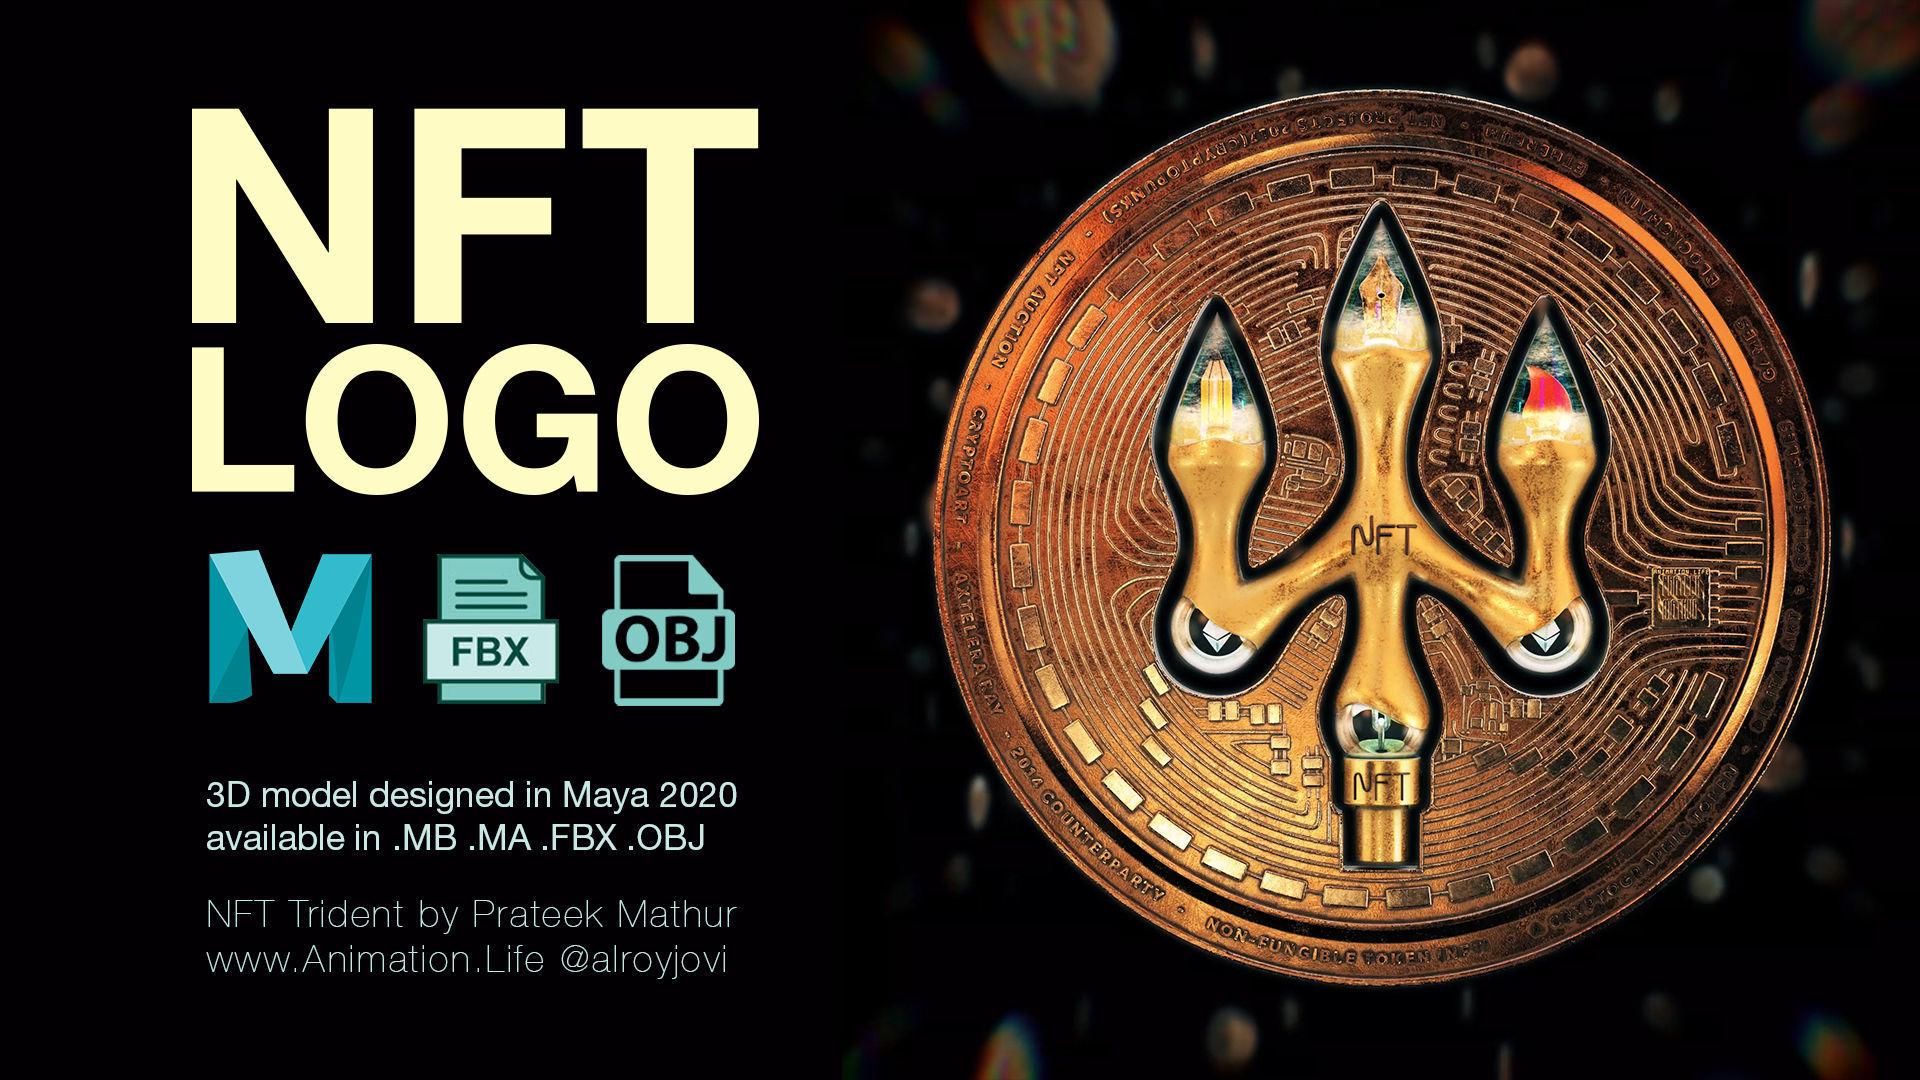 NFT LOGO - NFT Trident